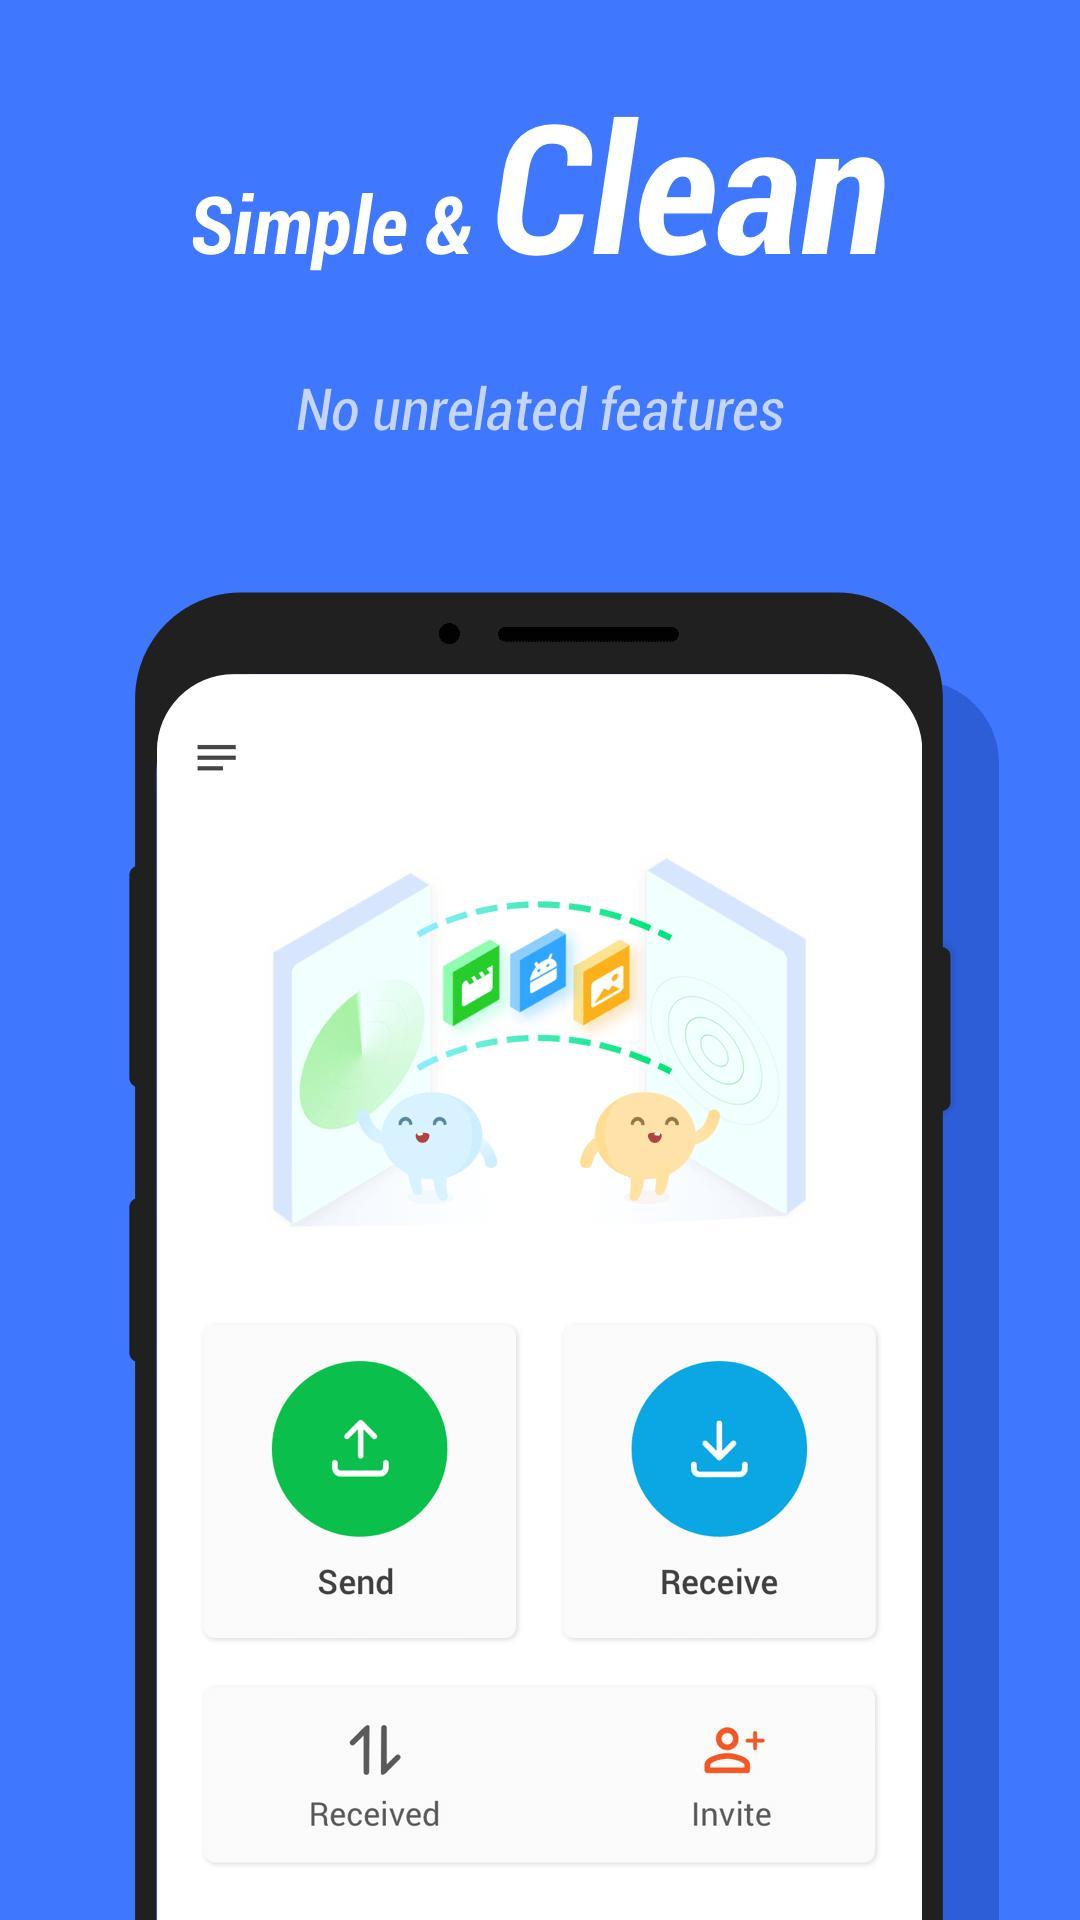 InShare Share Apps & File Transfer 1.2.1.4 Screenshot 4